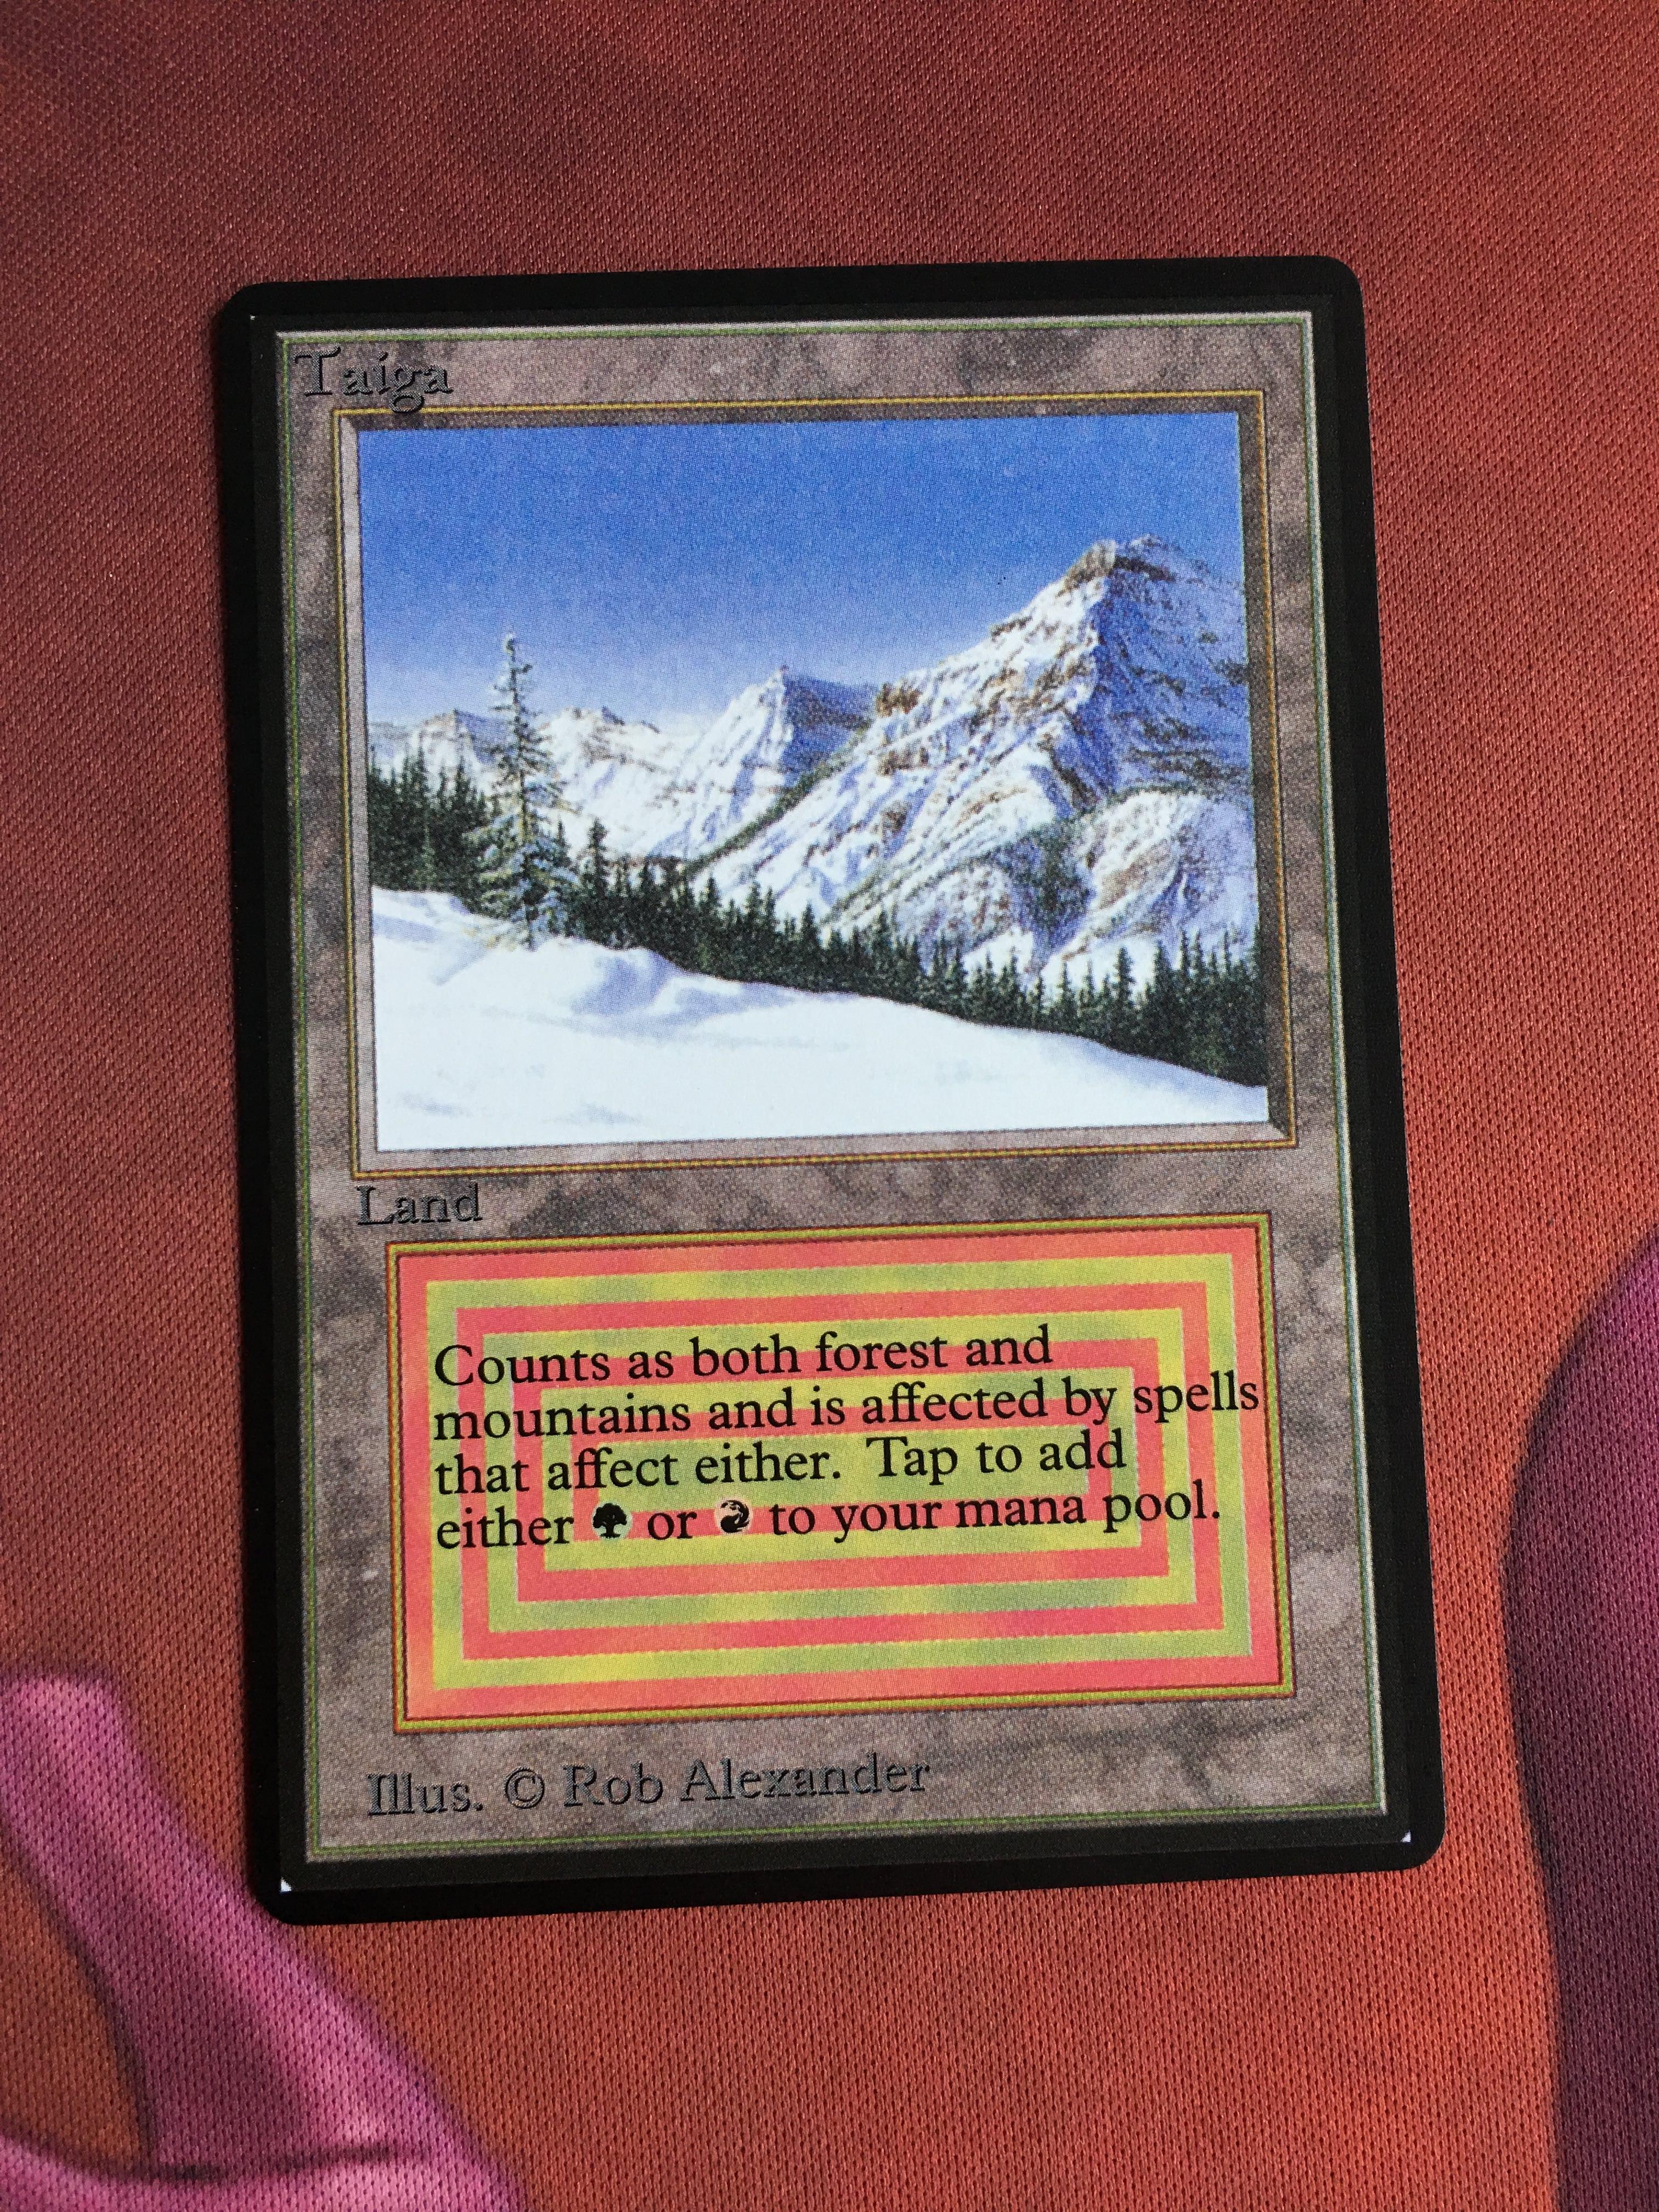 Taiga Beta Magician ProxyKing 8.0 VIP The Proxy Cards To Gathering Every Single Mg Card.